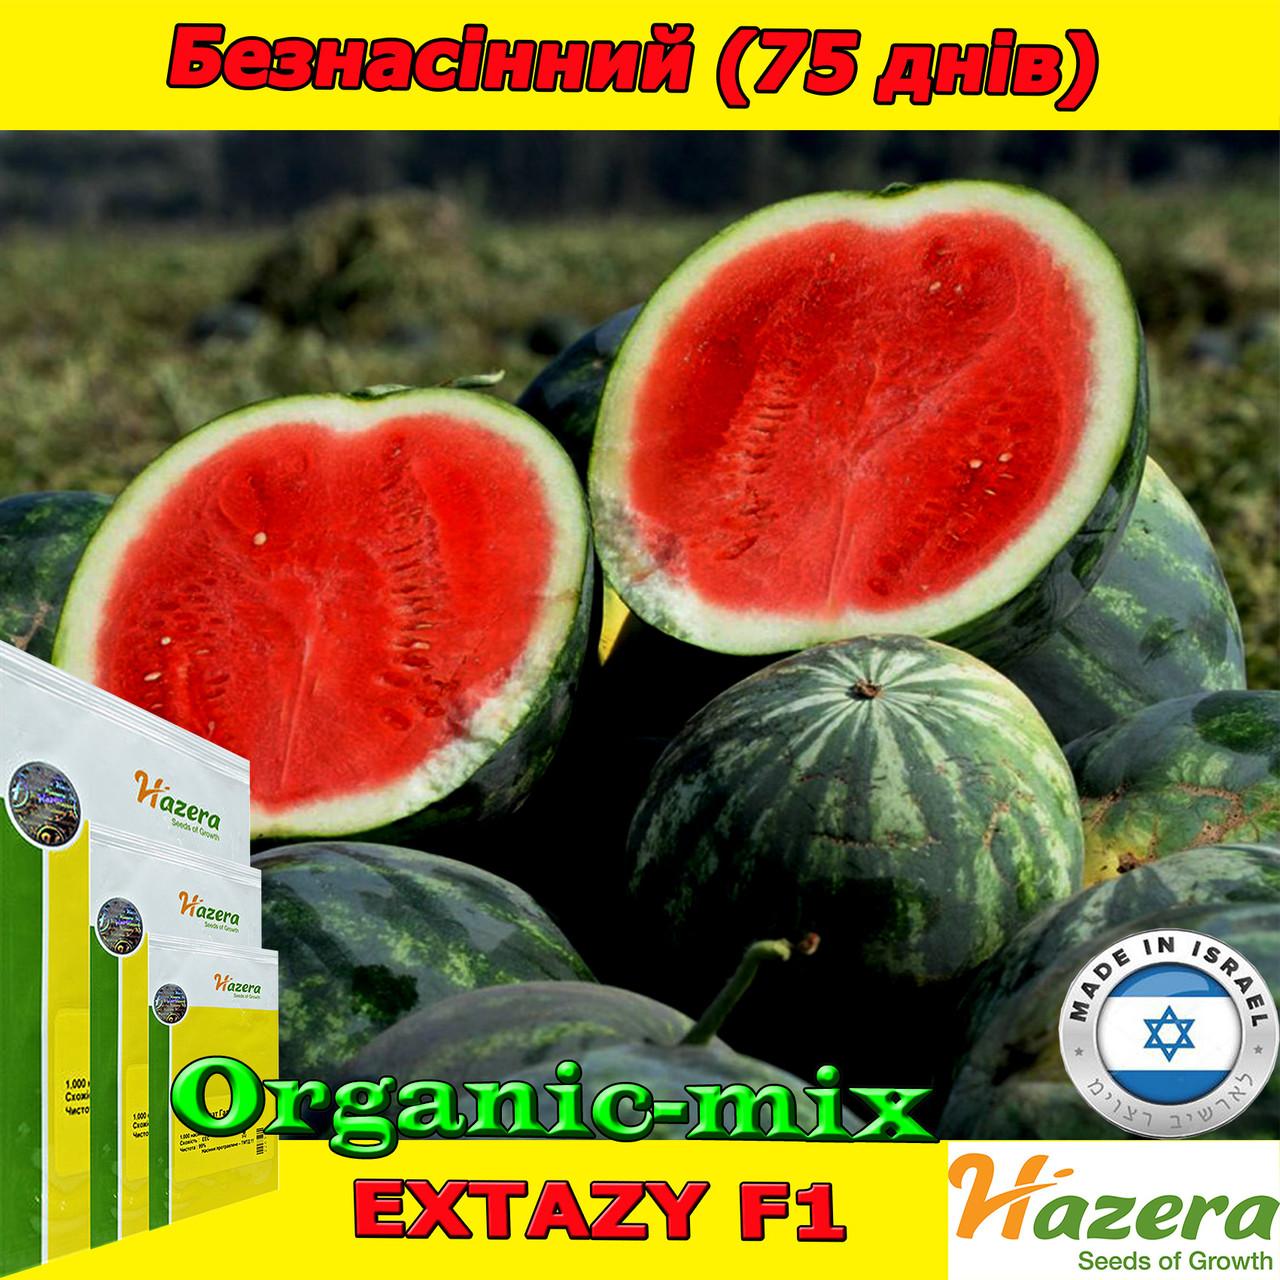 Семена, арбуз бессемянный, ЭКСТАЗИ F1, ТМ Нazera (Израиль) проф. пакет 500 семян